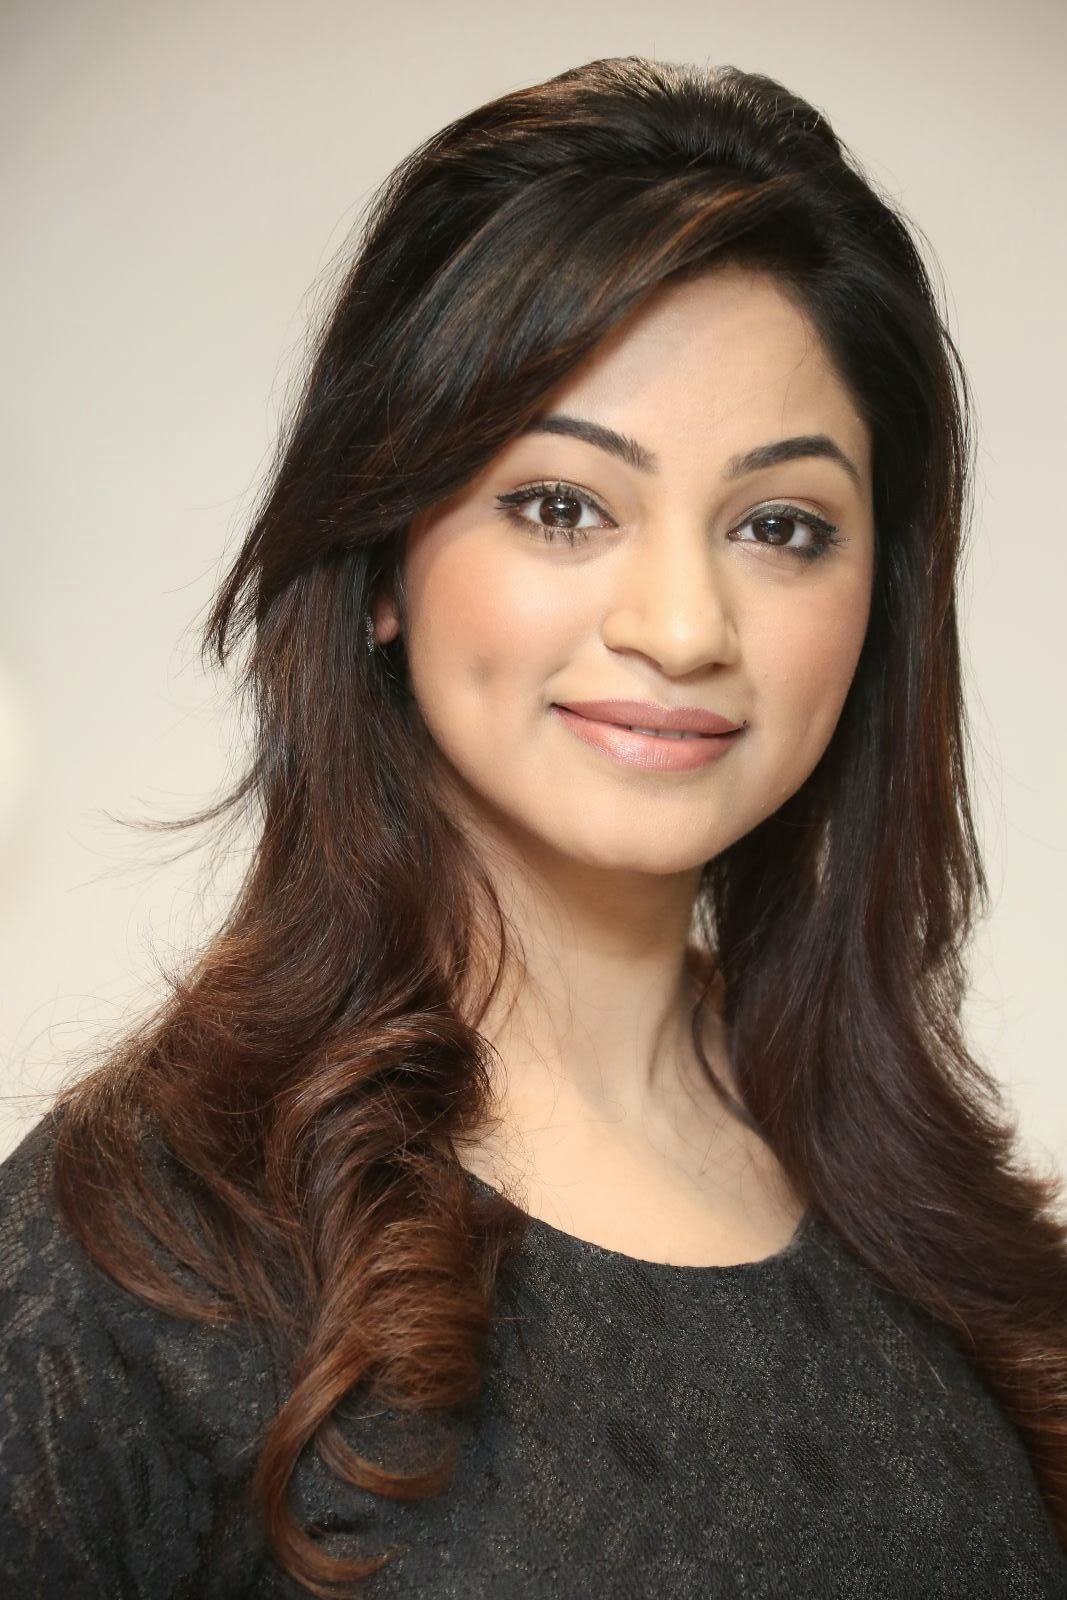 Shilpi sharma face photos